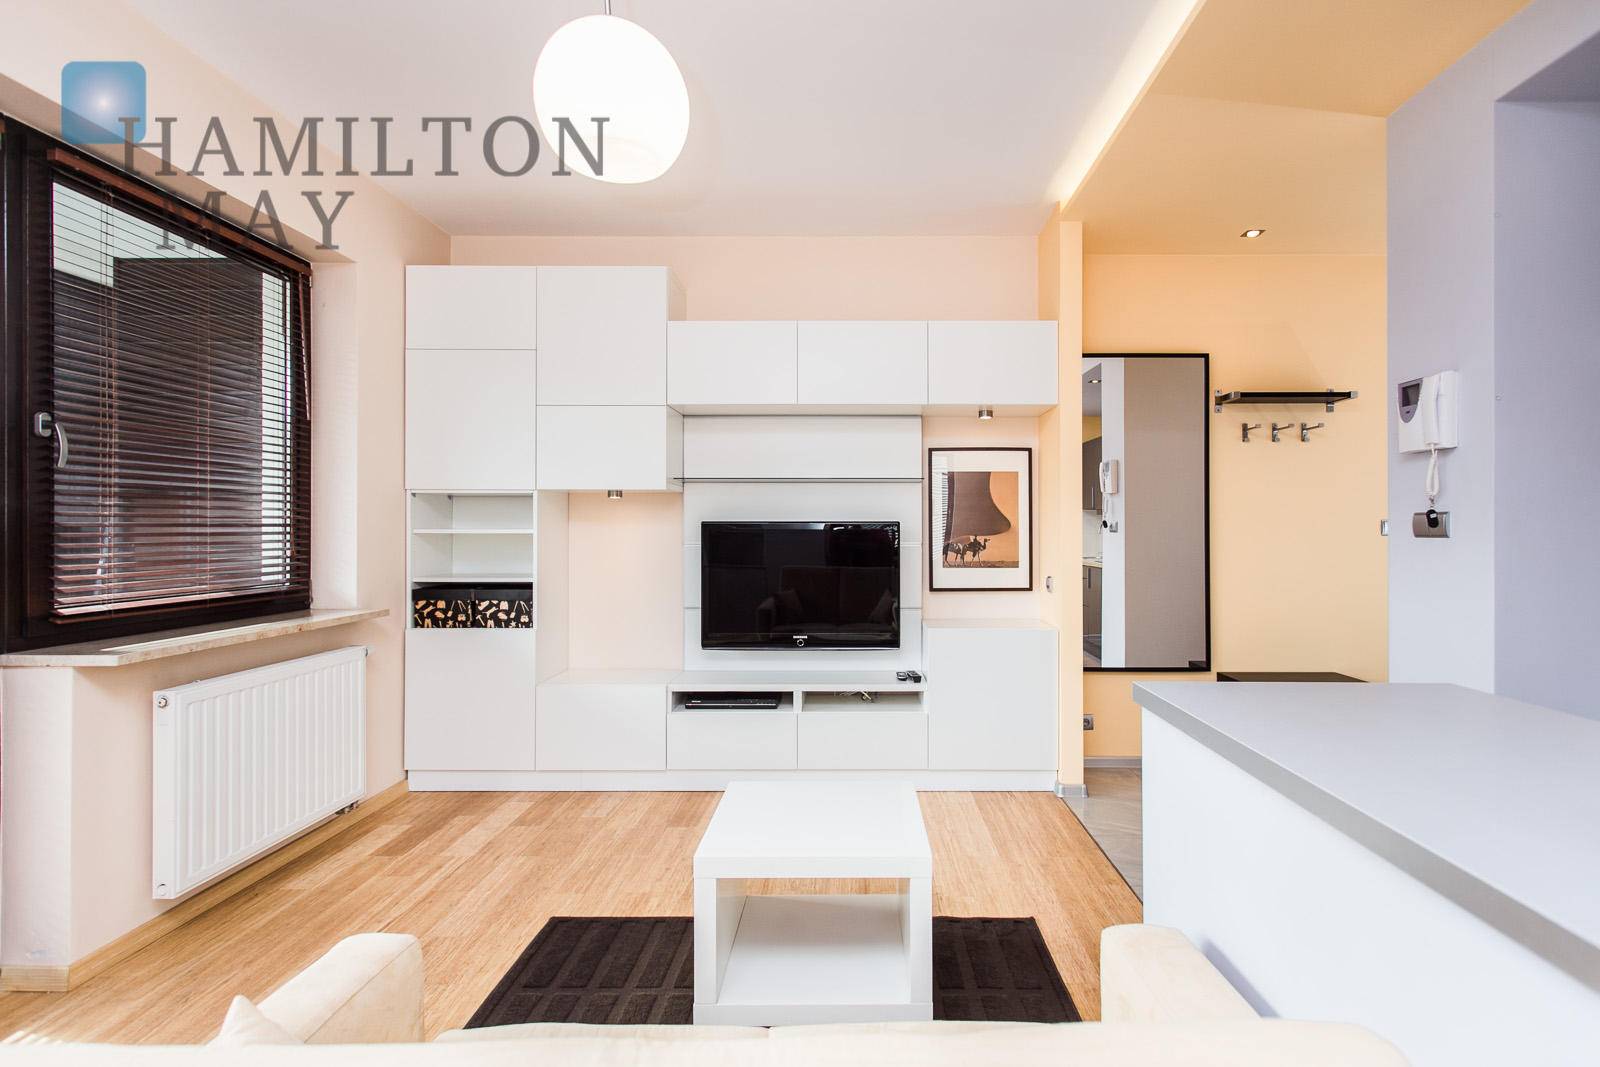 Studio Apartments for rent Krakow – Hamilton May